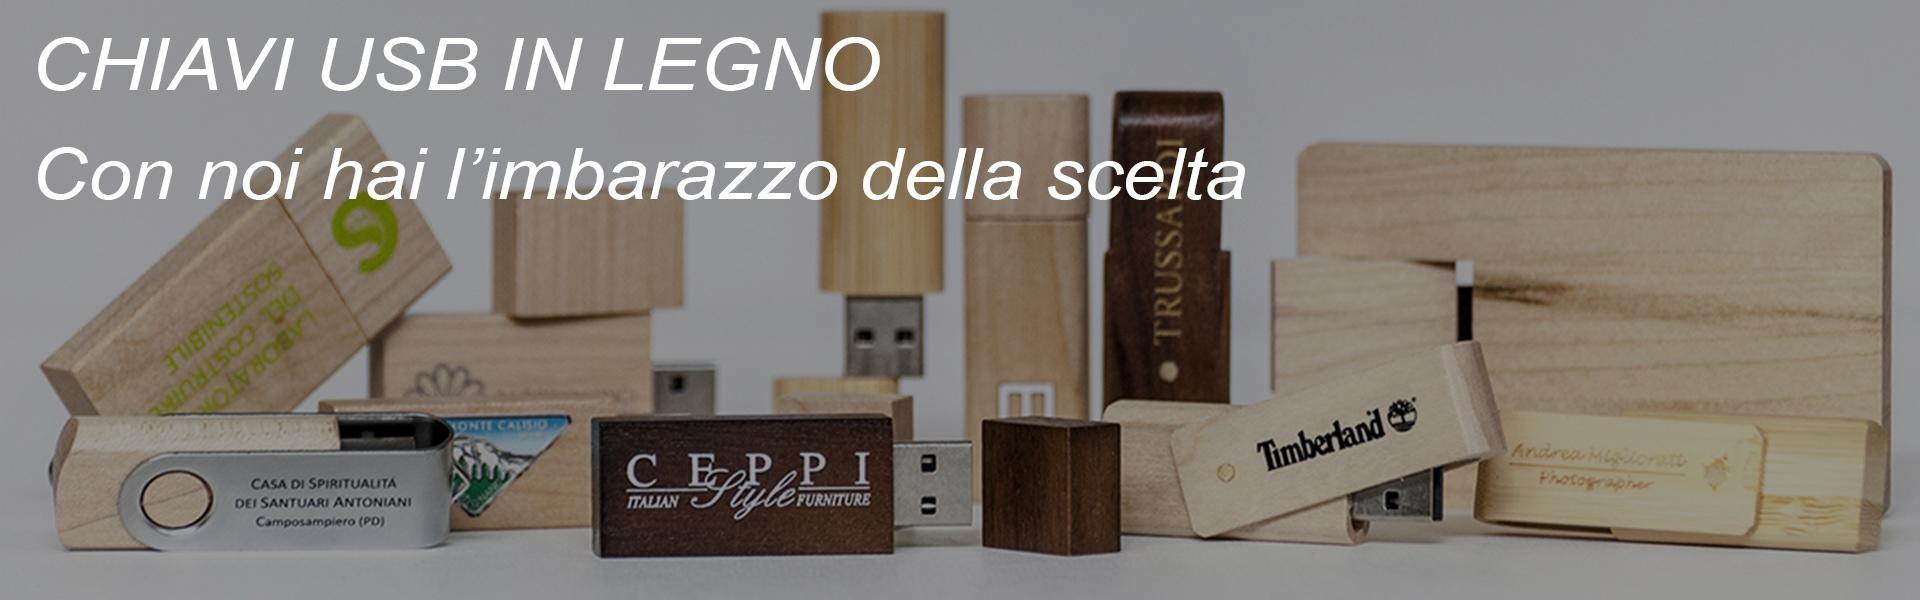 Chiavette USB in legno